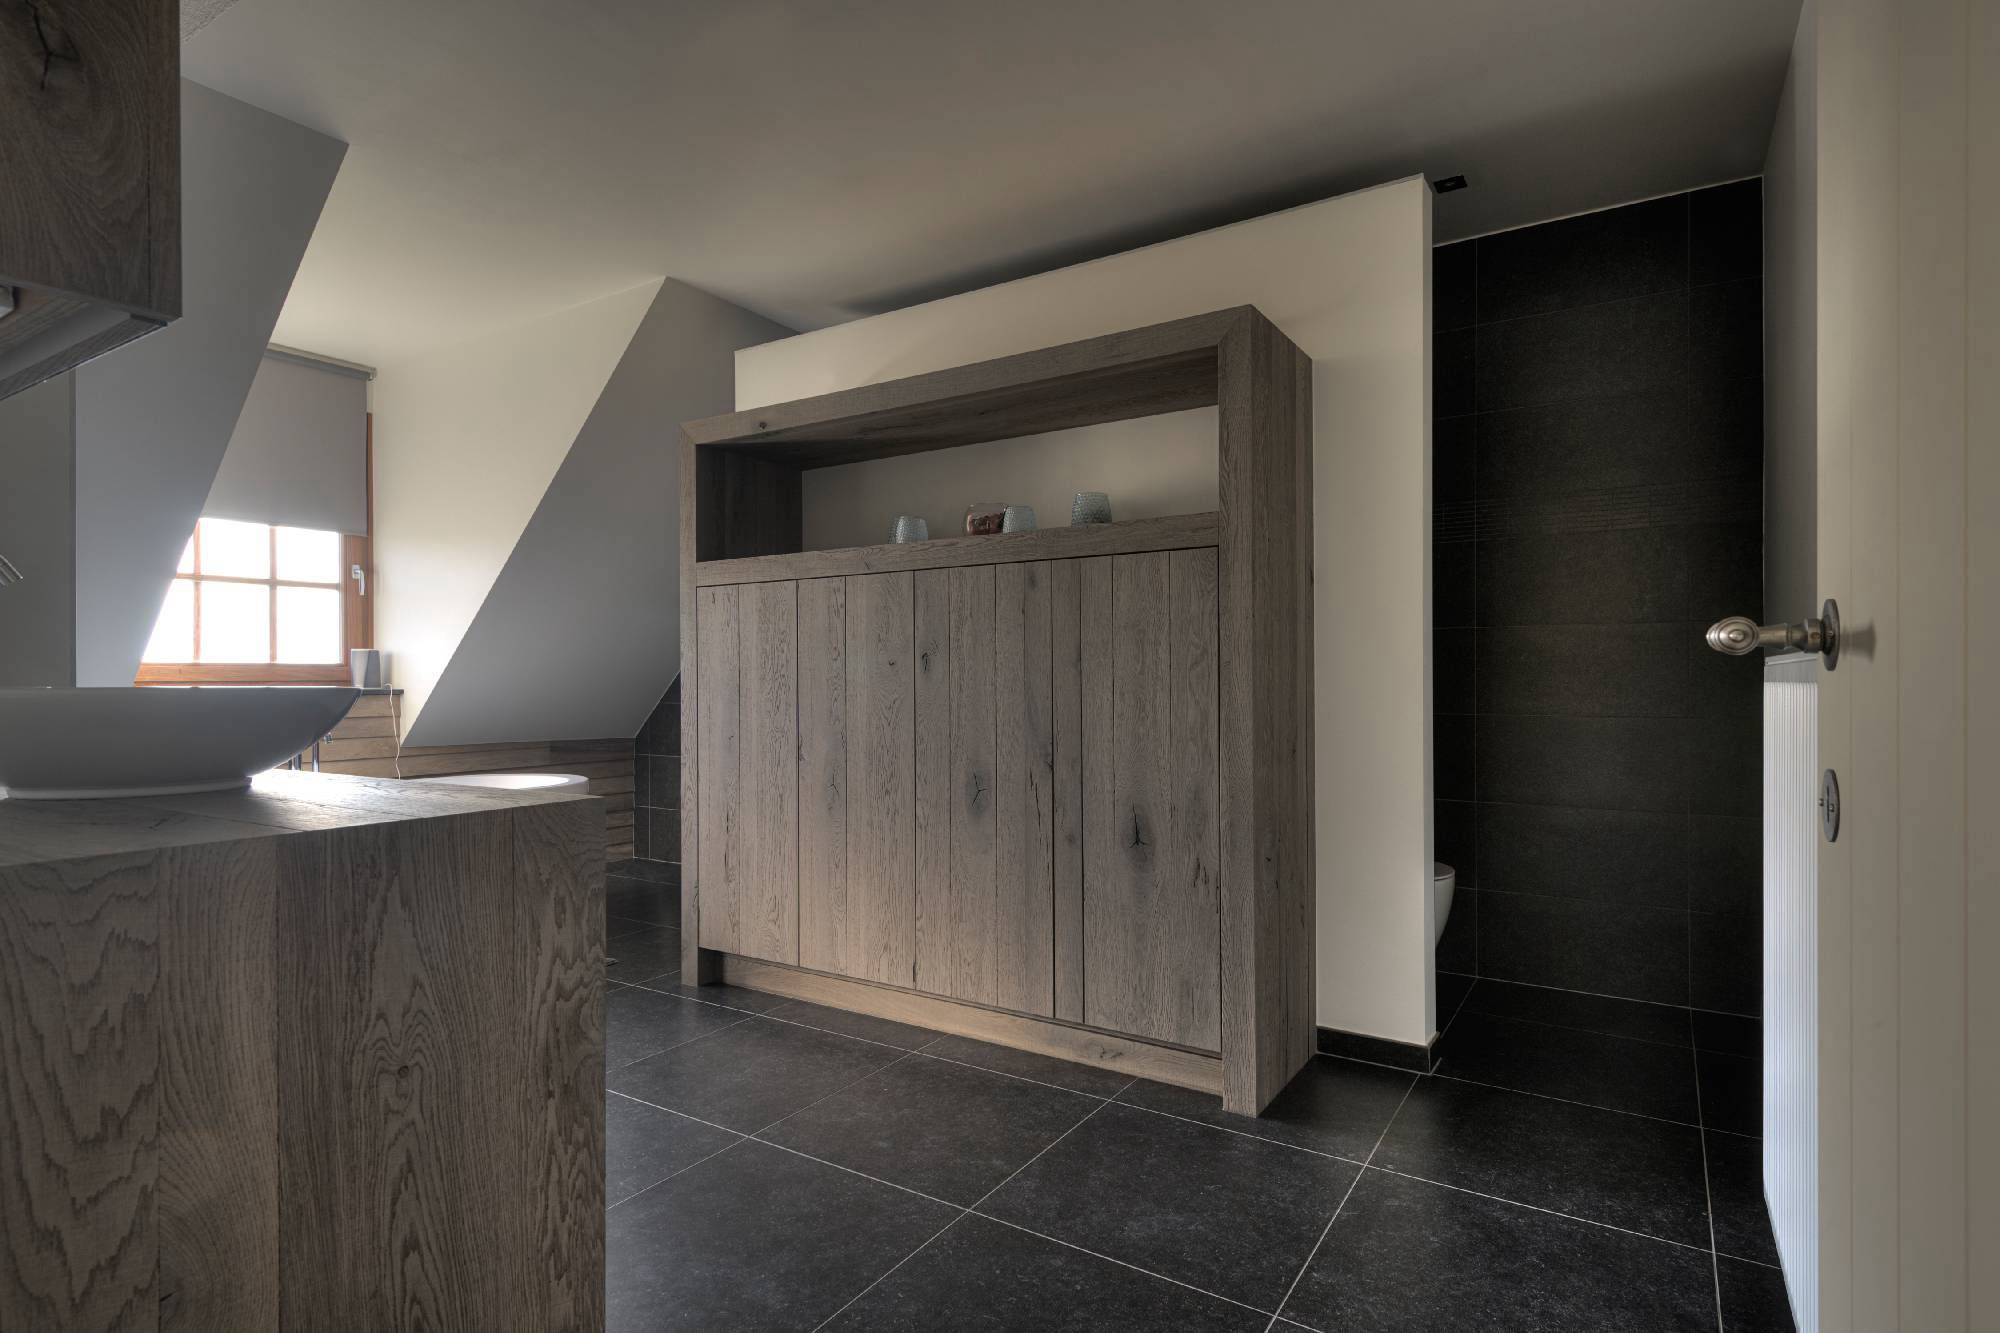 Renovatie Badkamer Dessel : Van oerle interieur badkamers badkamer nieuwe badkamer